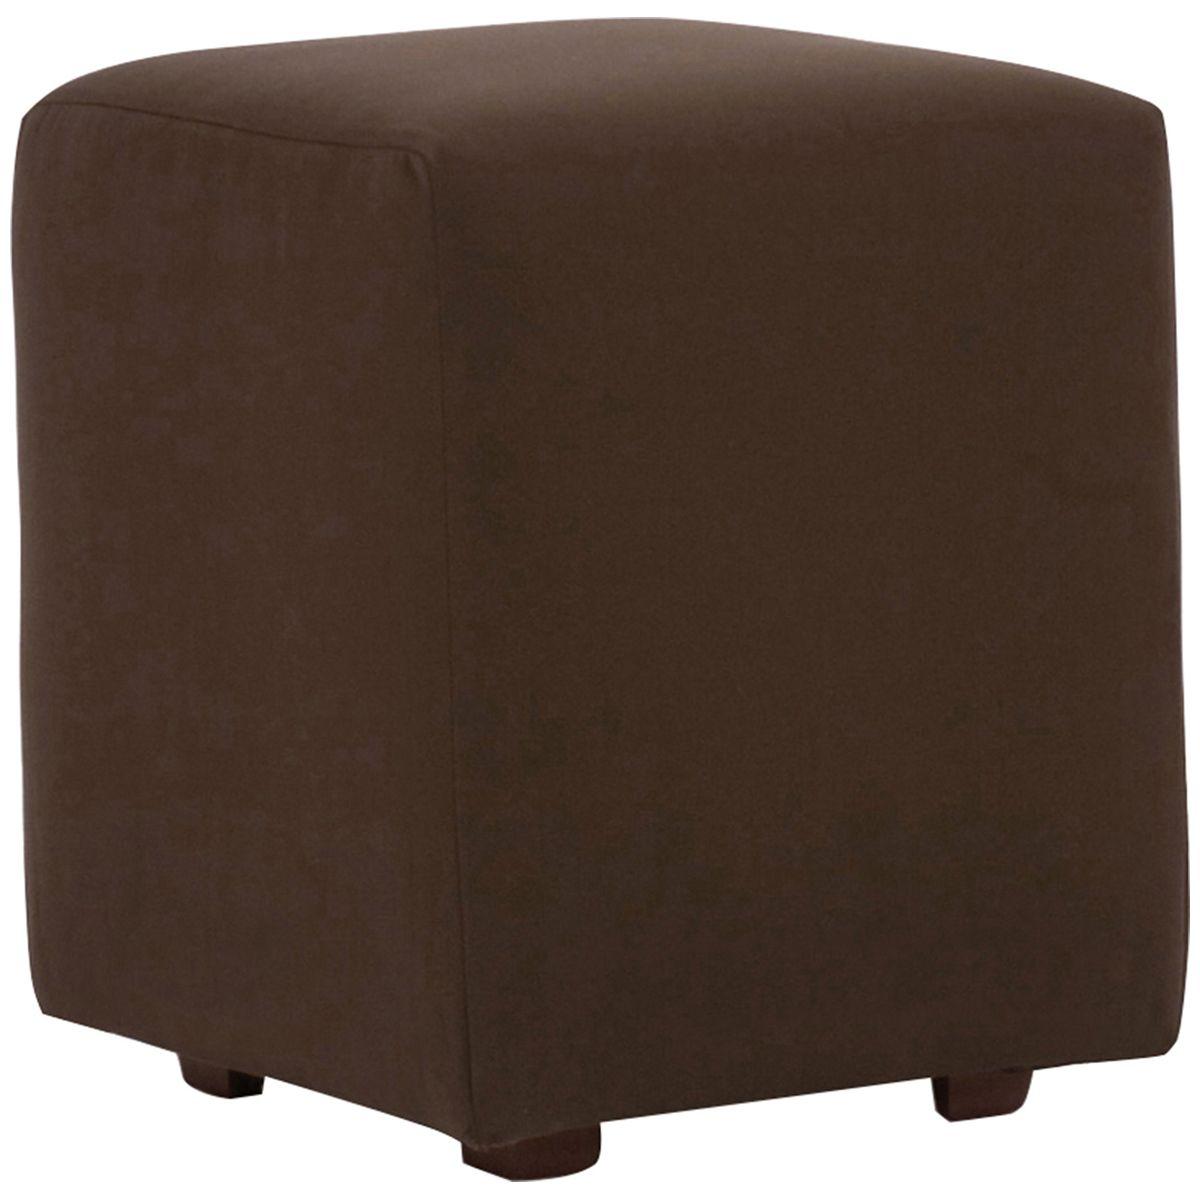 Howard Elliott Seascape Chocolate Universal Cube Ottoman Q128-462